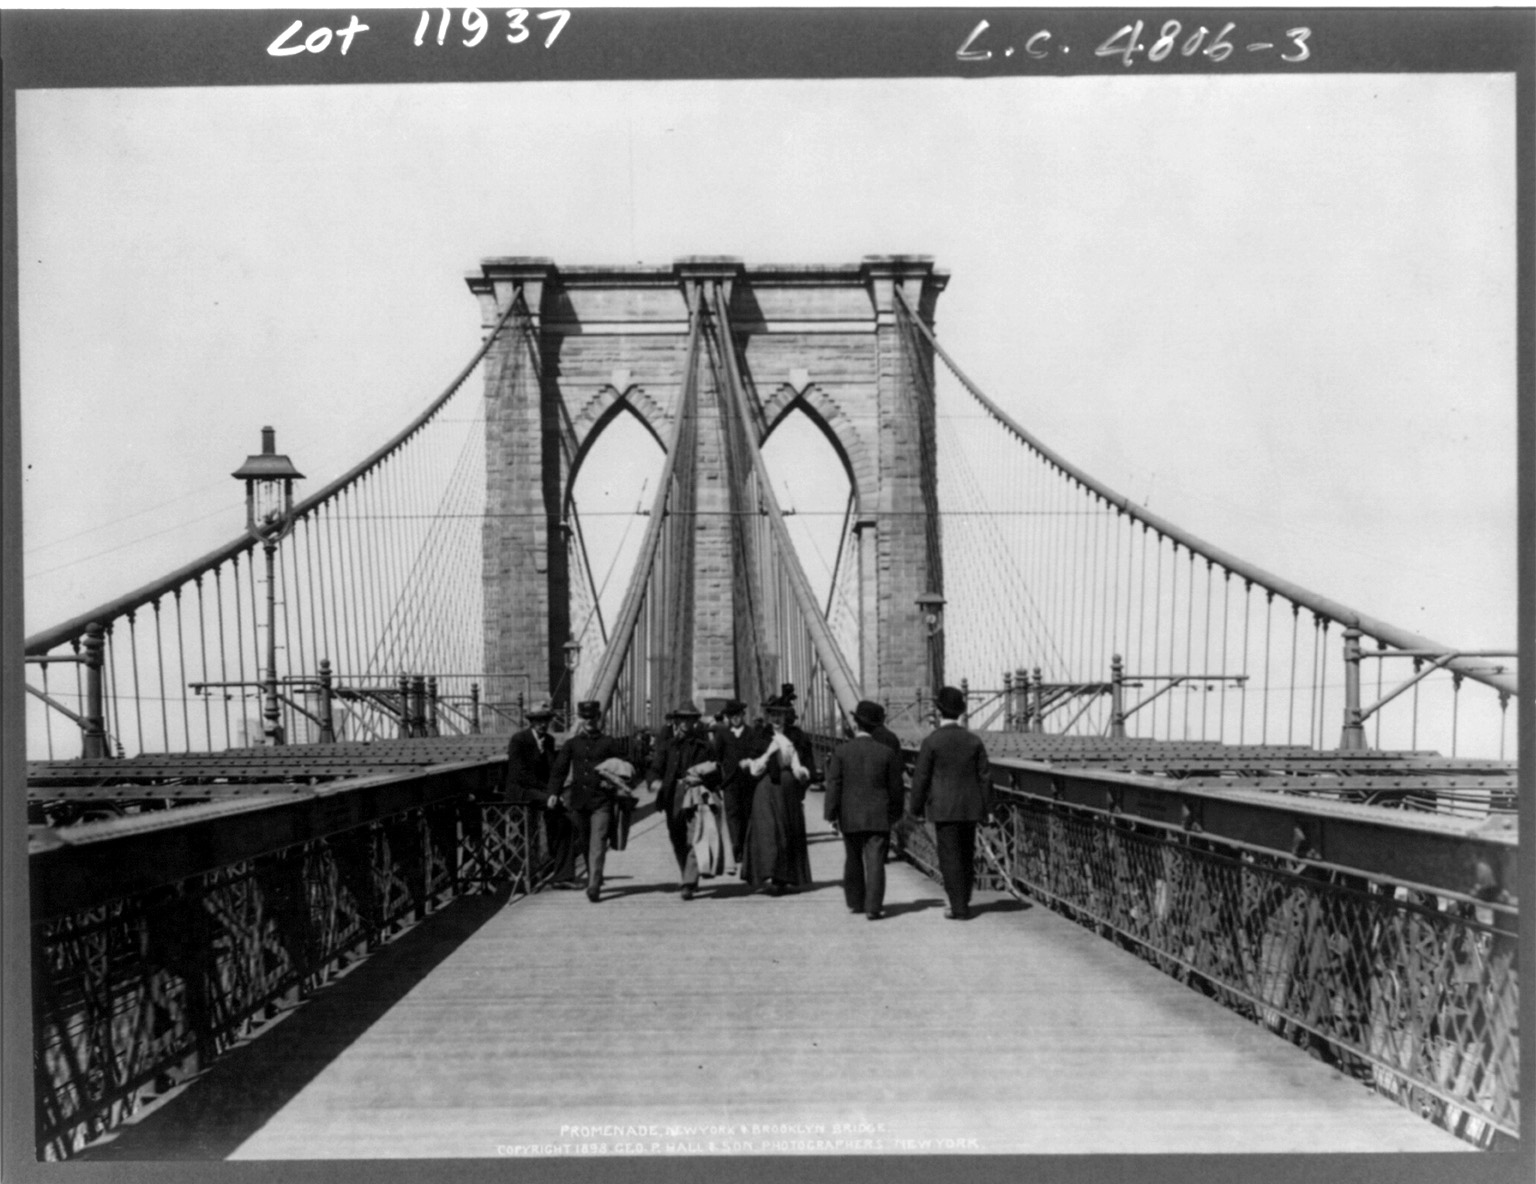 Pedestrian crossing at the Brooklyn Bridge in New York City (1898)